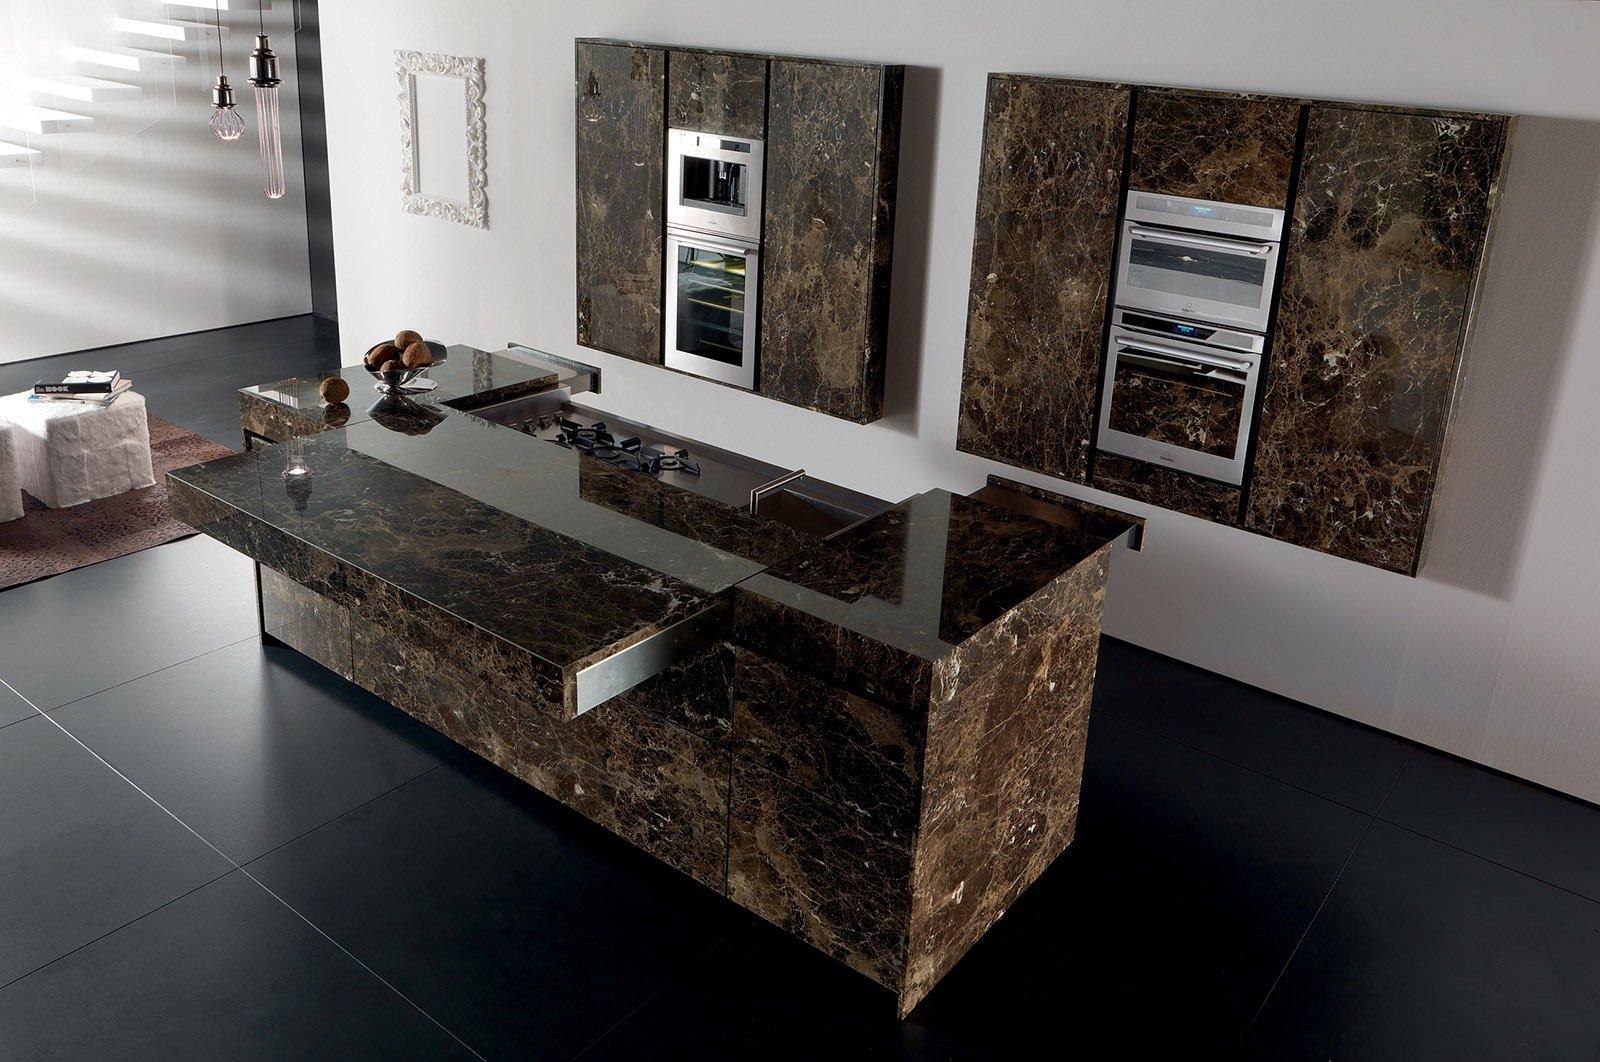 Cucine decorate per un ambiente originale e vivace cose di casa - Cucine in marmo ...